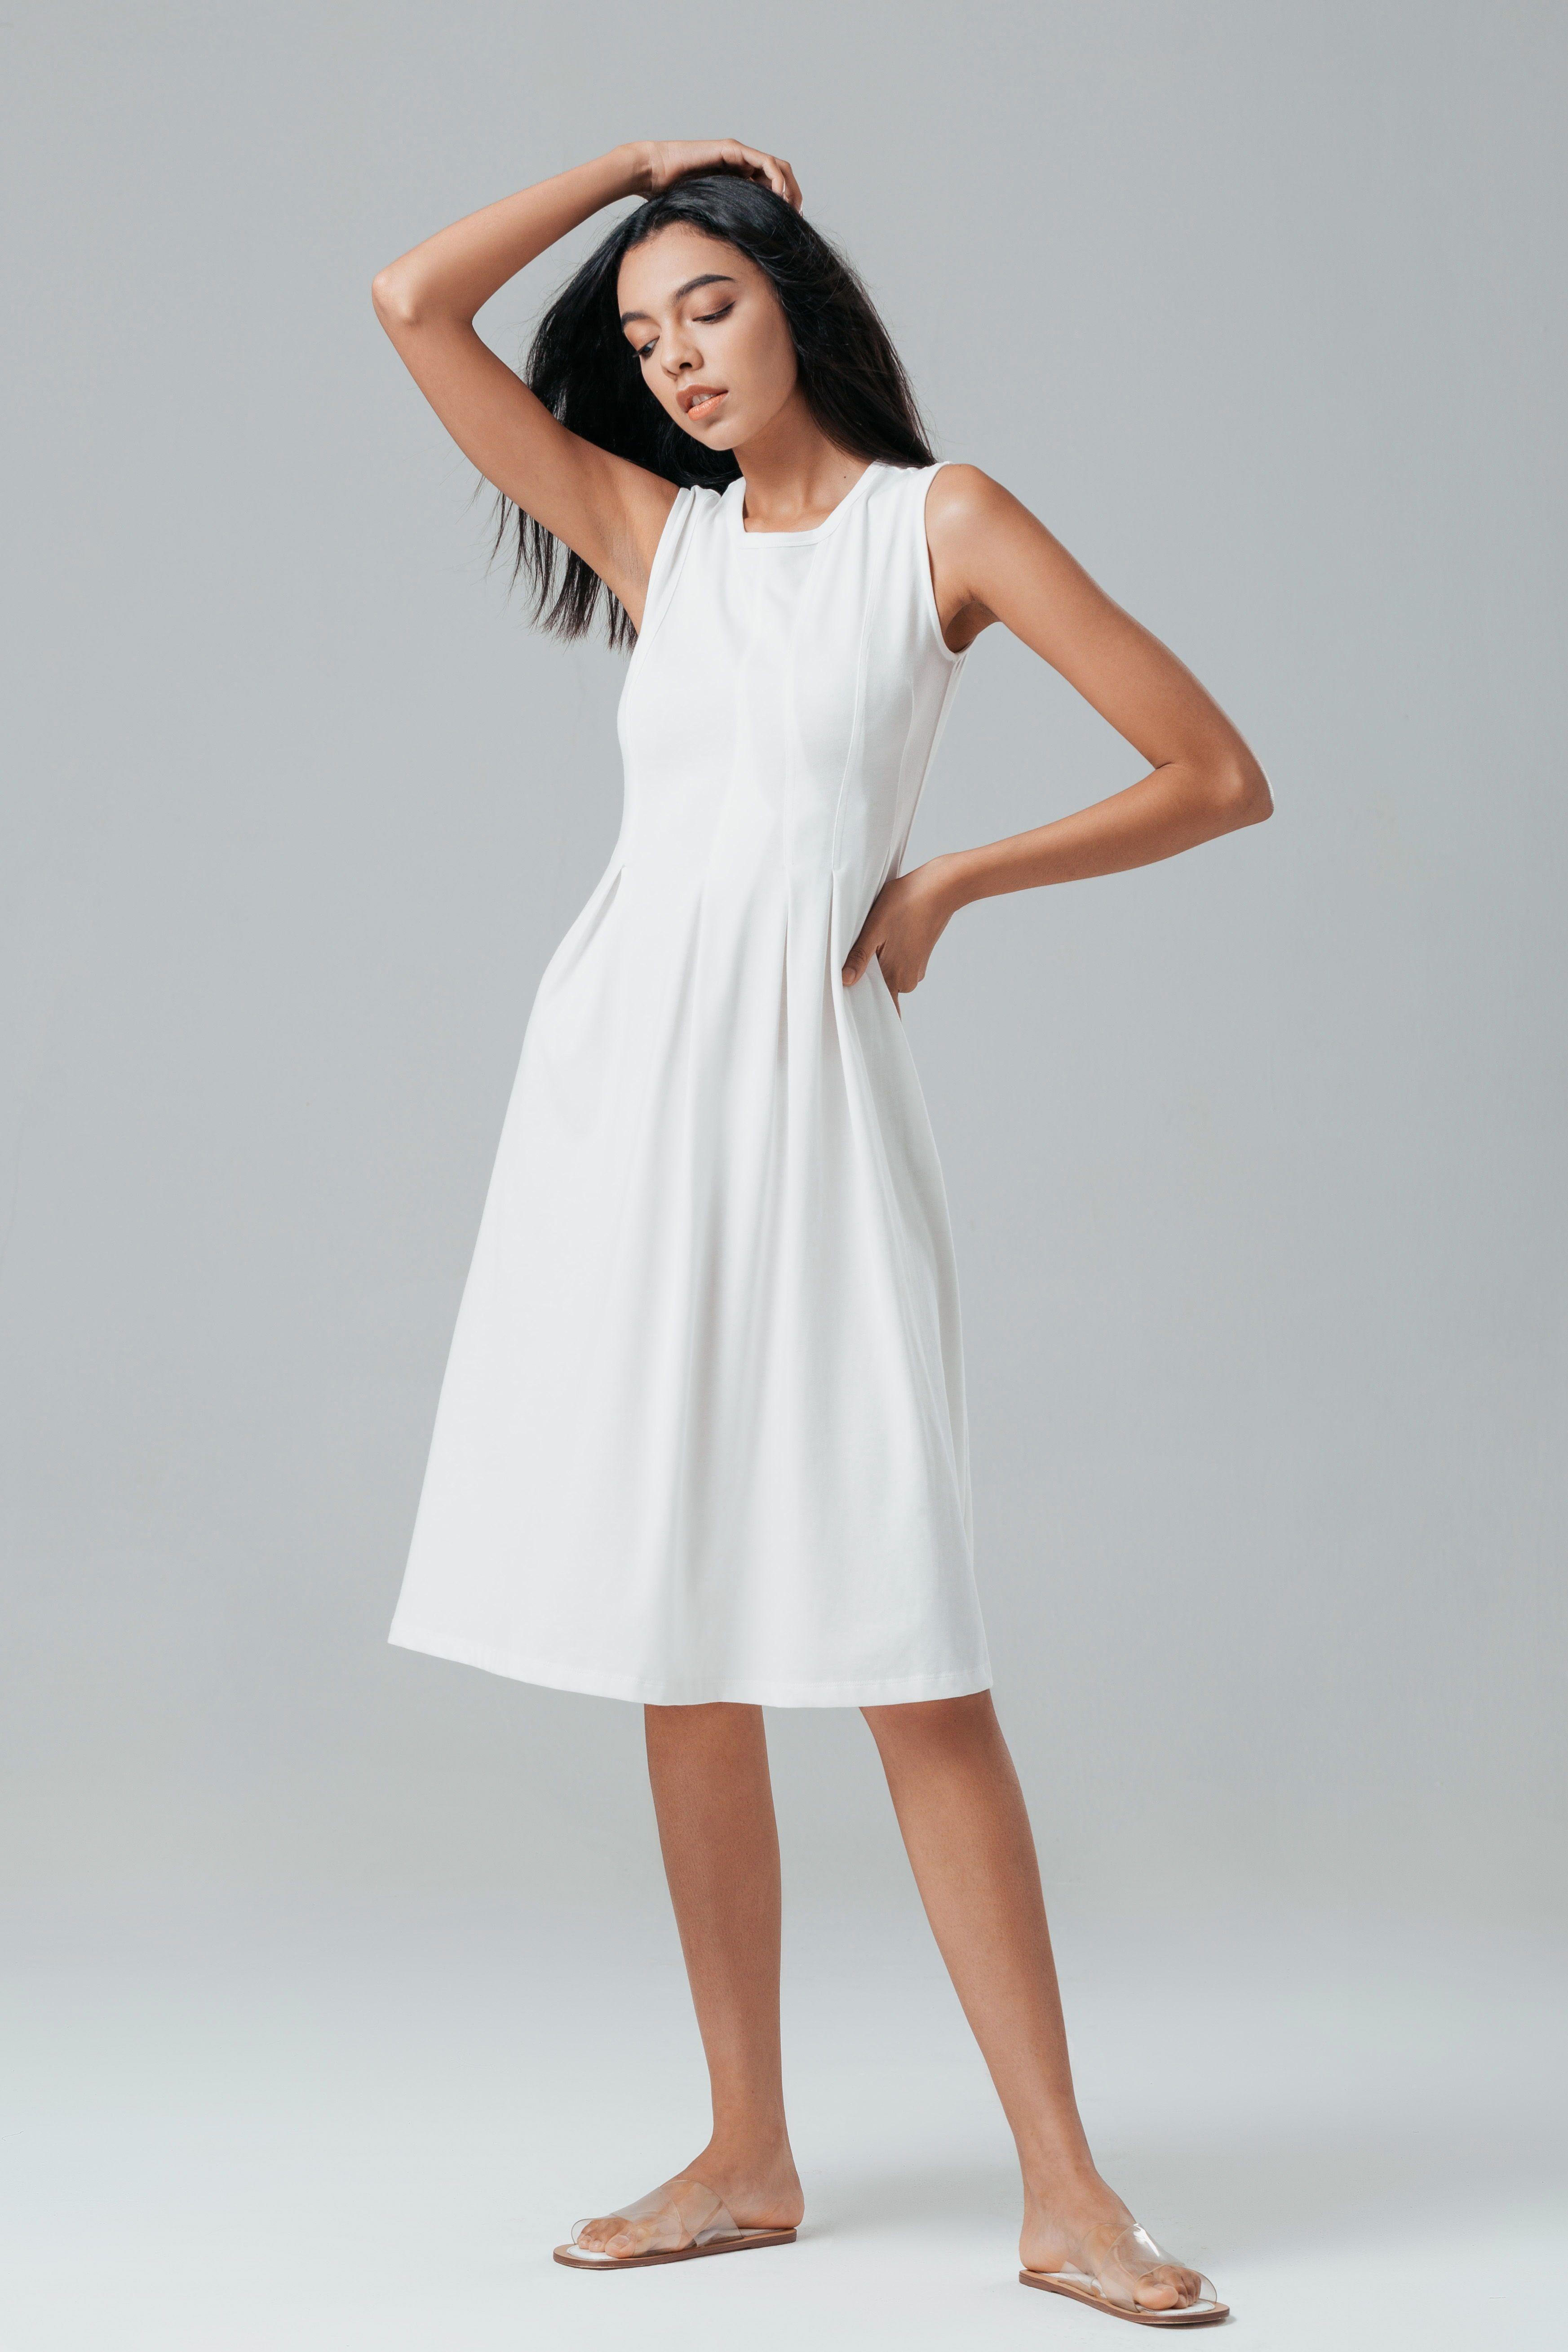 Volans Midi Dress White Dresses Spring Outfits Women Vegas Dresses [ 5235 x 3490 Pixel ]